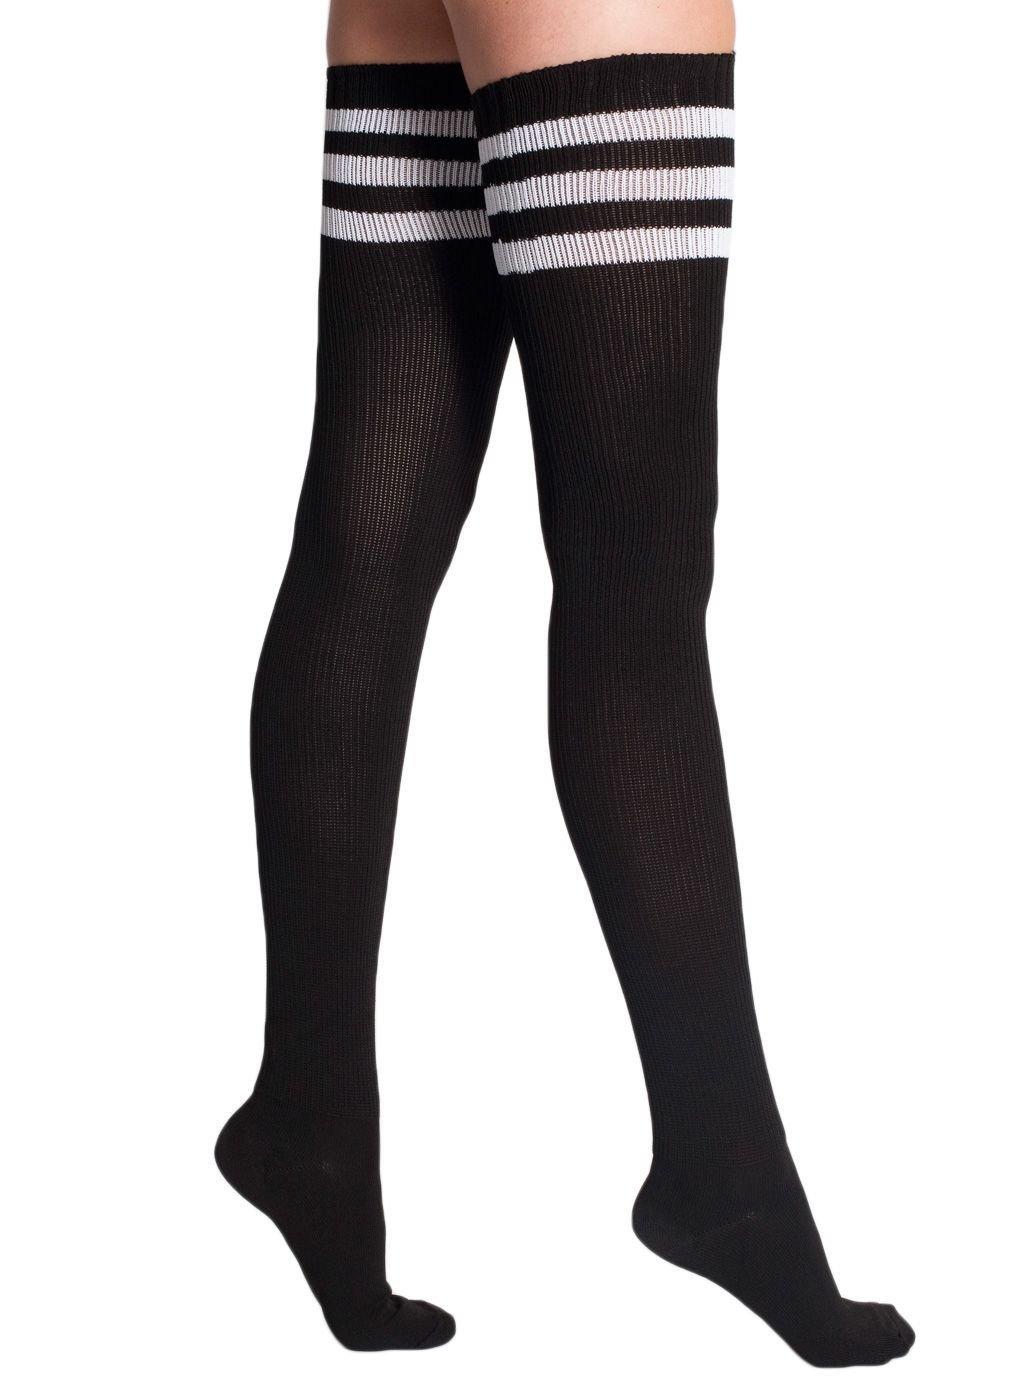 American Apparel Stripe Thigh-High Socks